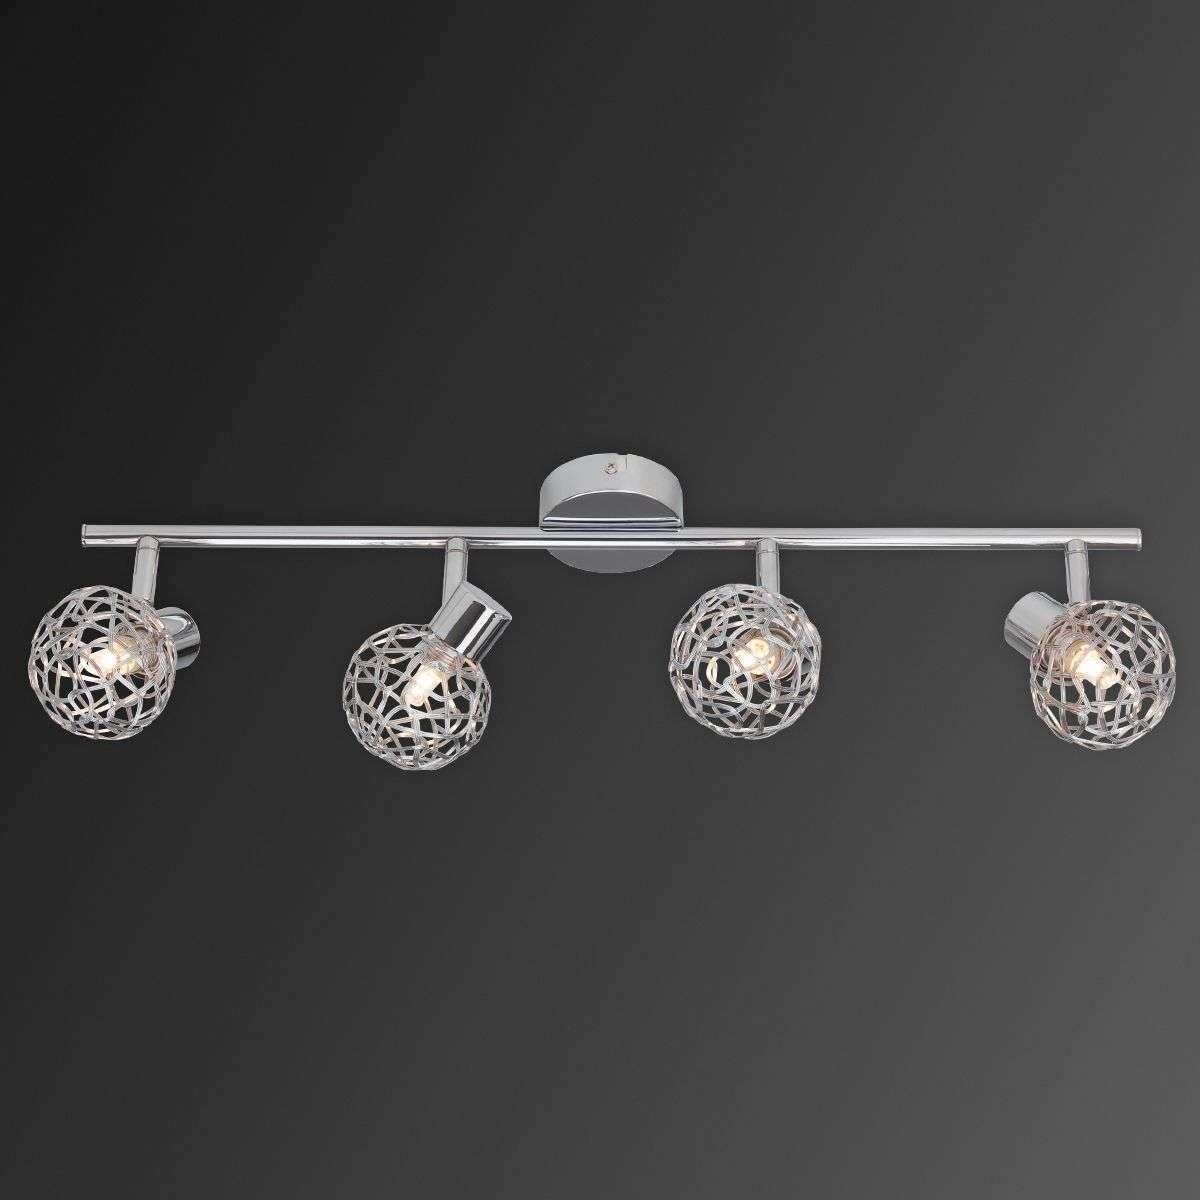 Stylish halogen ceiling light virgo 4 bulb lights stylish halogen ceiling light virgo 4 bulb 1508969 31 aloadofball Choice Image